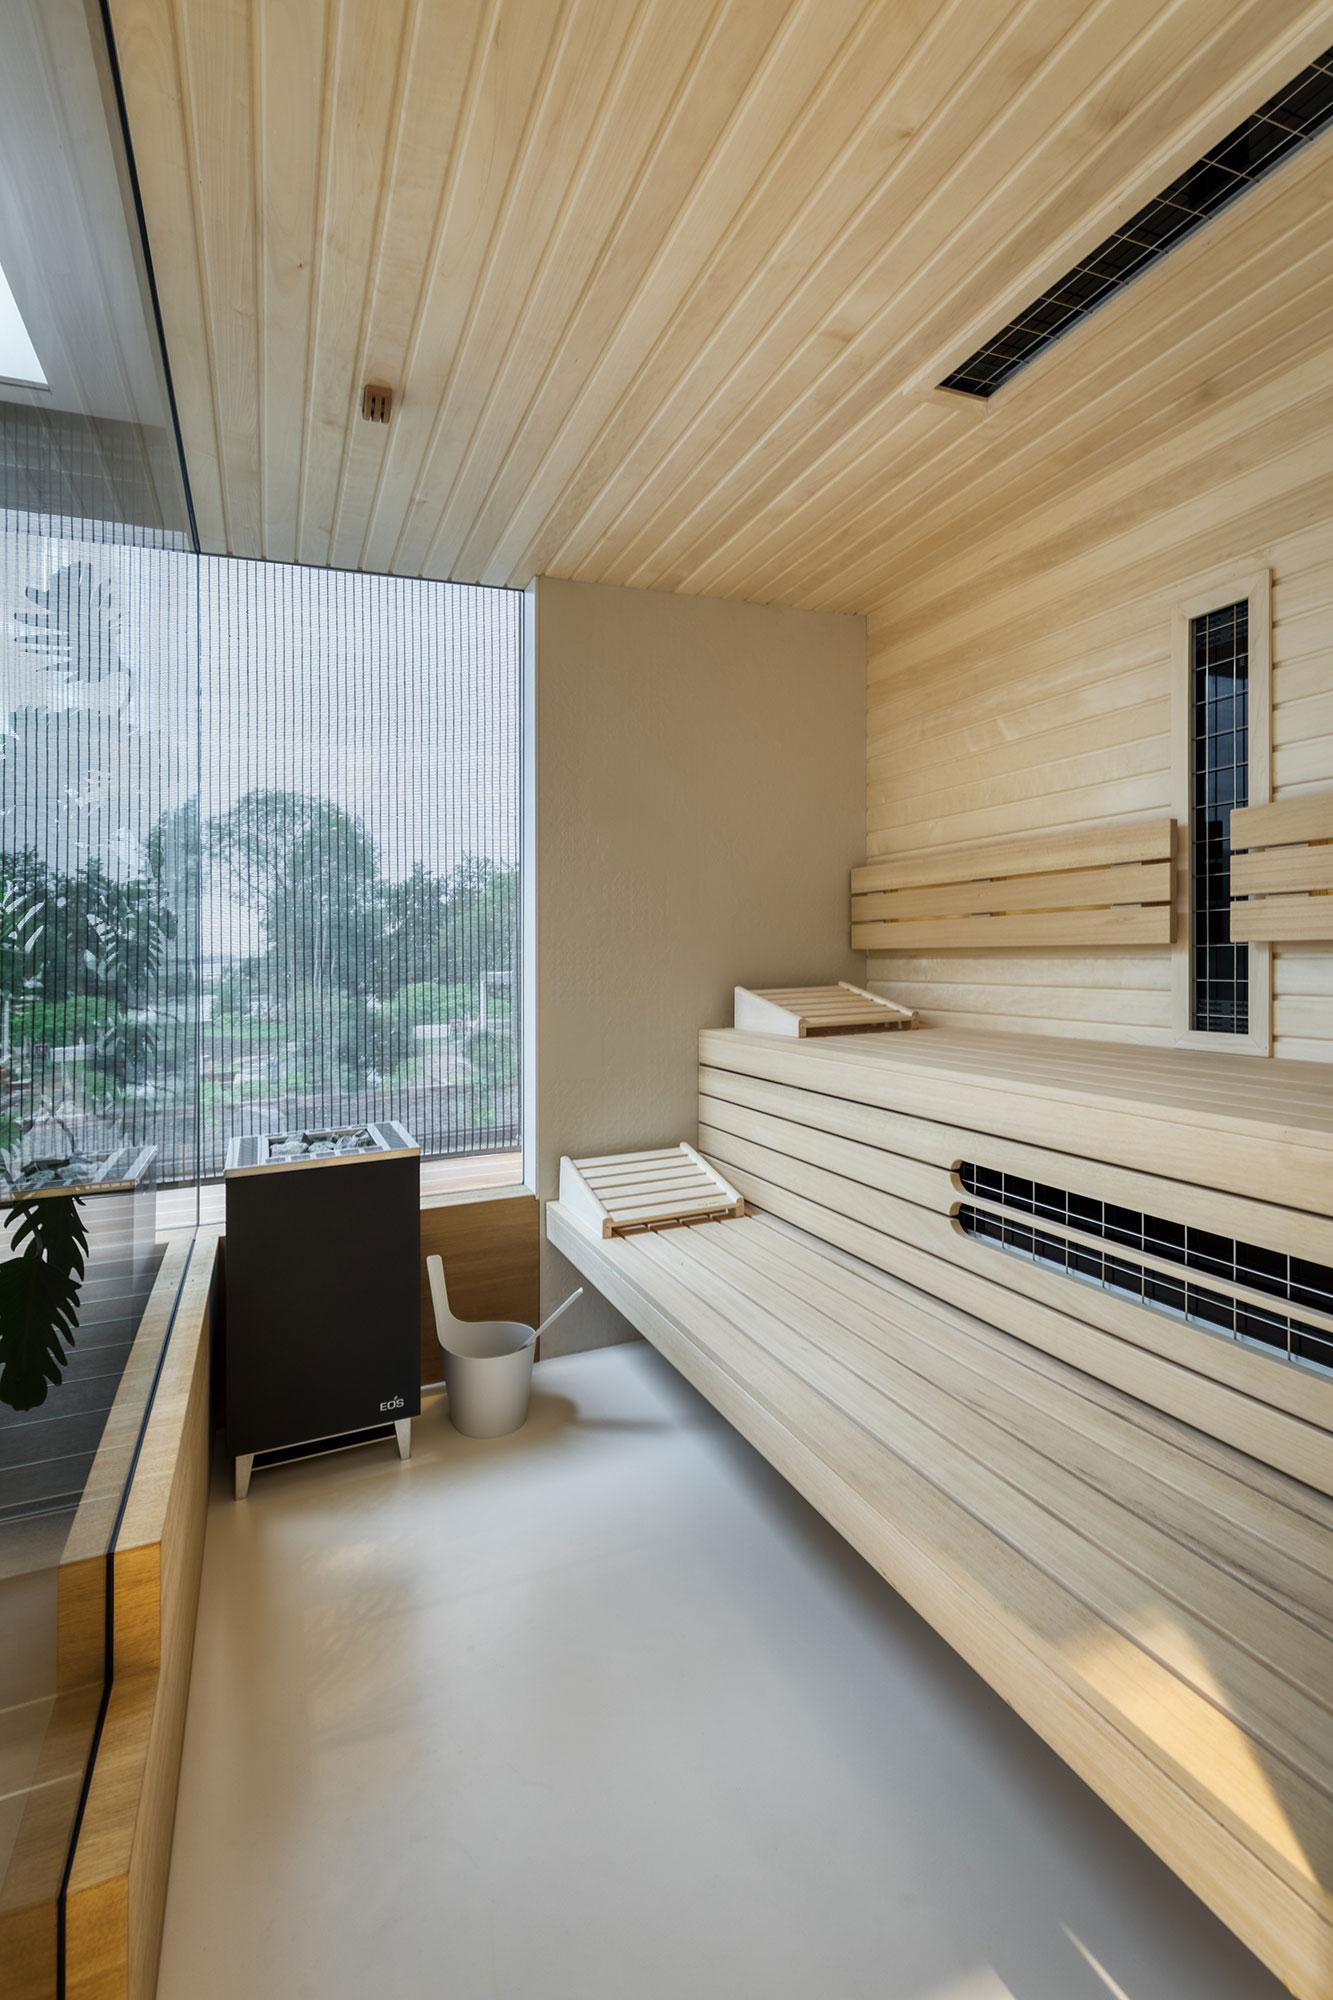 interieurarchitectuur sauna